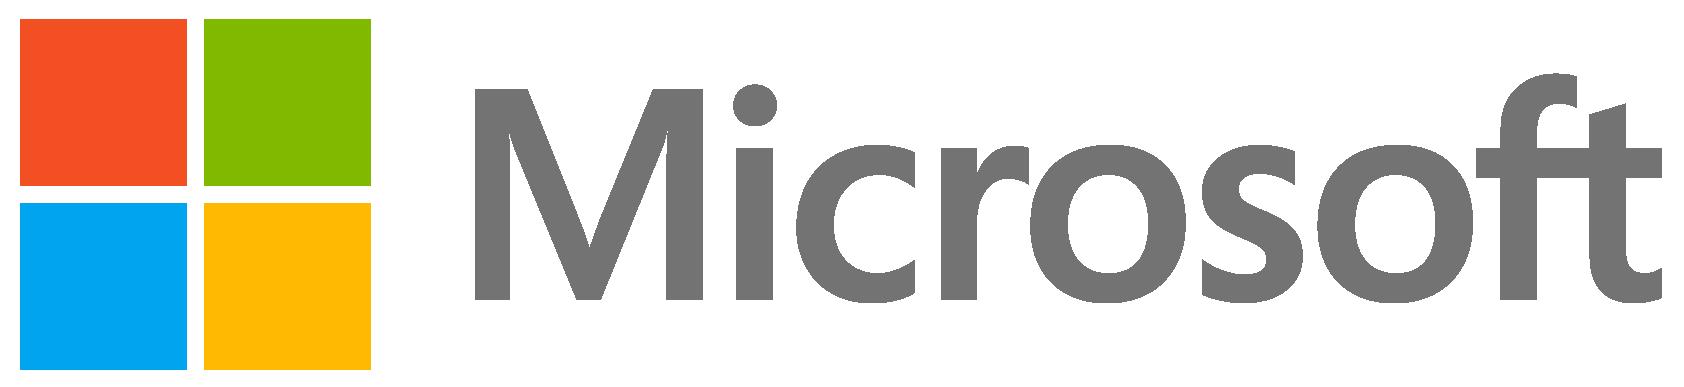 microsoft_PNG3.png